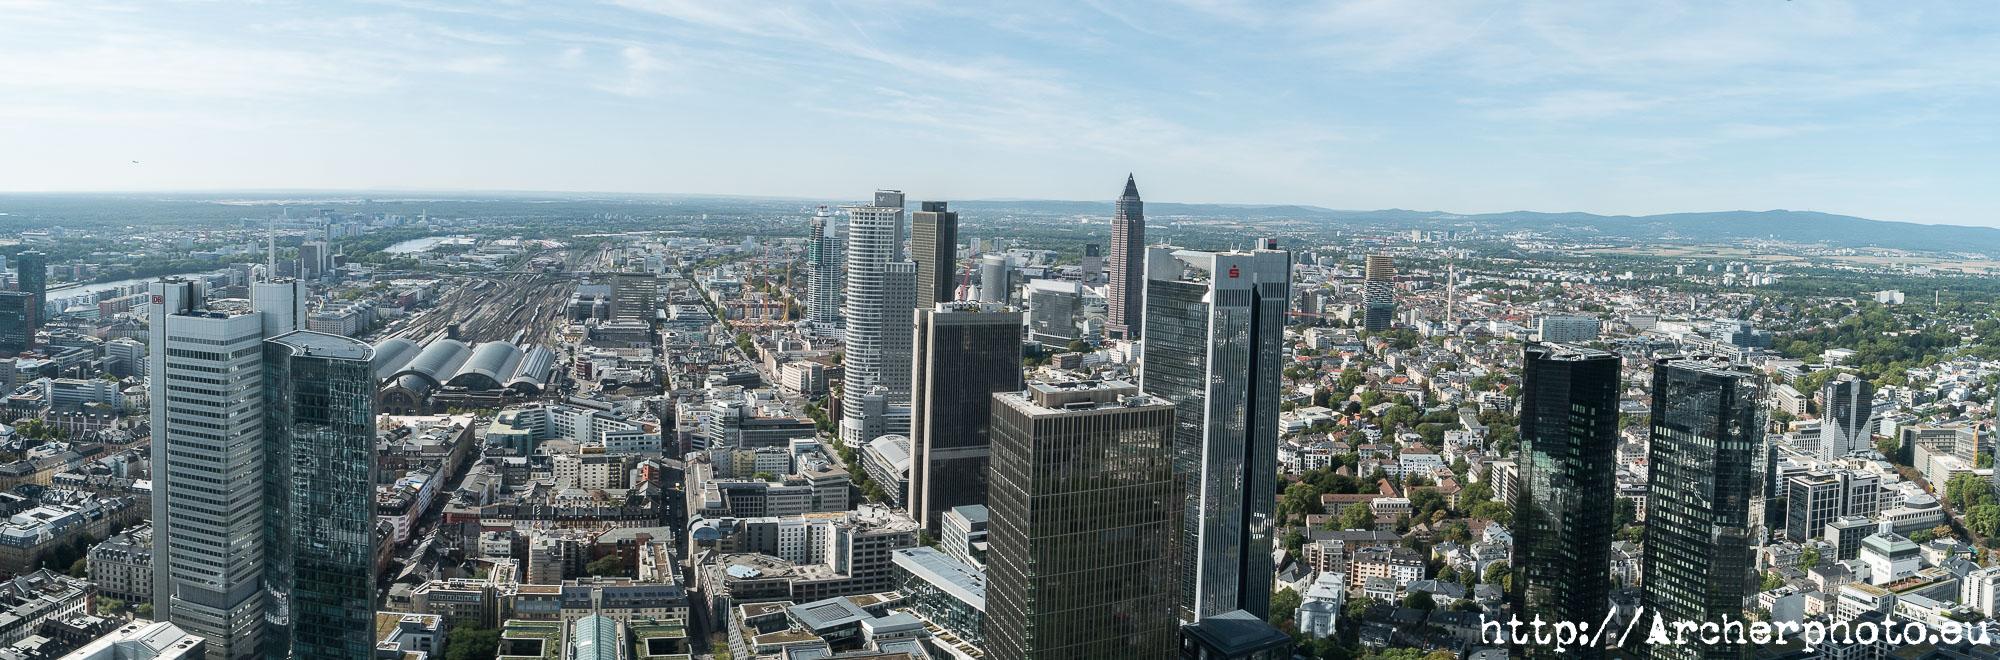 Frankfurt por Archerphoto, fotografía profesional